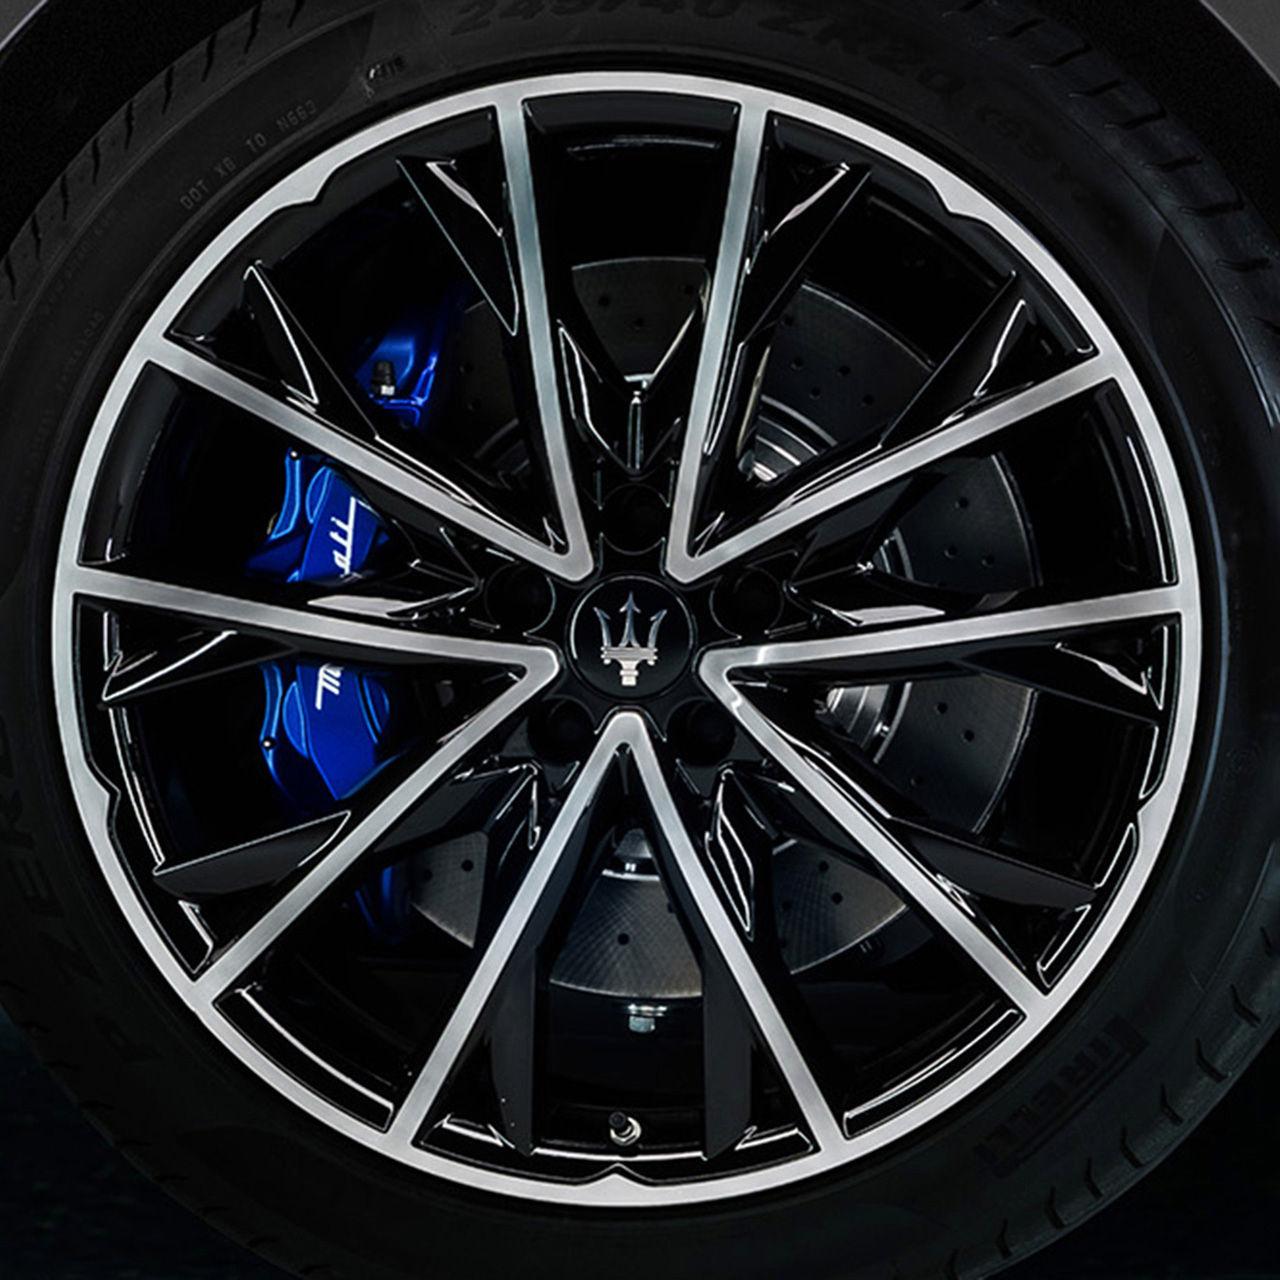 Maserati Ghibli - Exterieur - Reifen und Felge